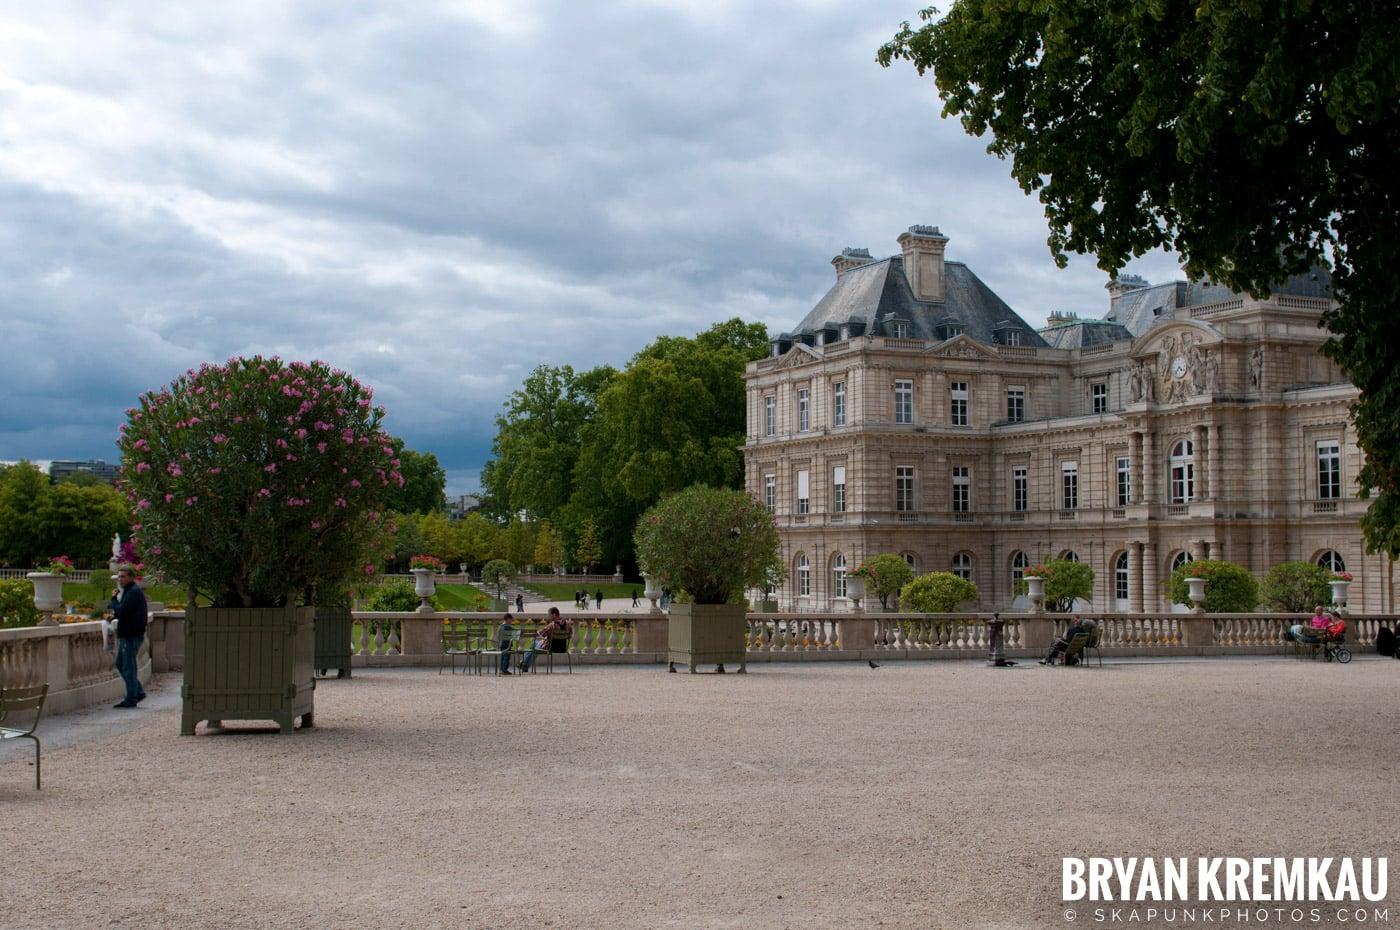 Paris, France Honeymoon - Day 1 - 7.18.11 (50)